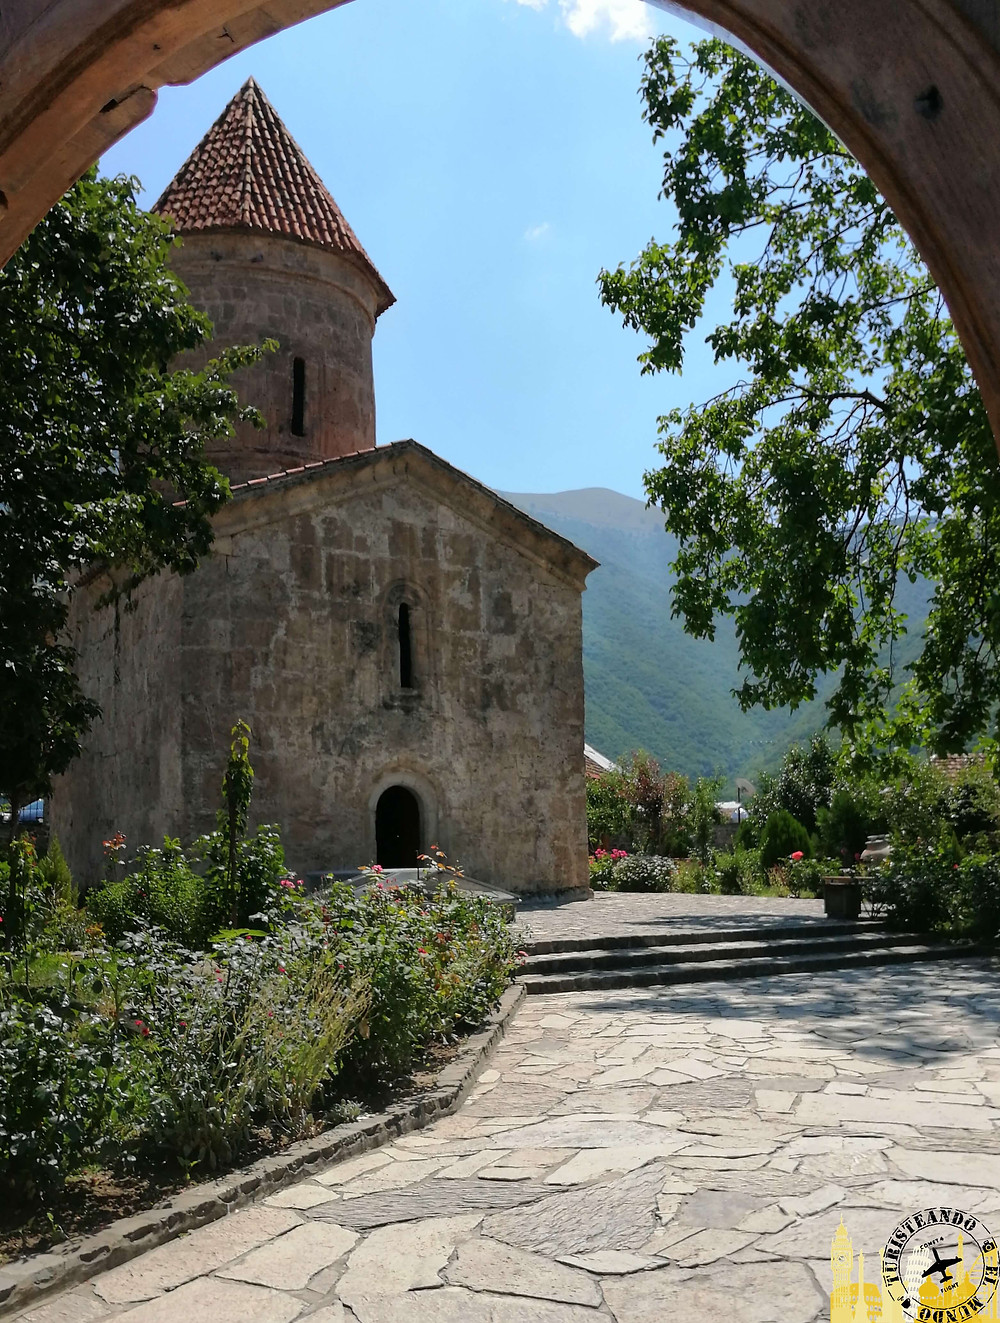 Iglesia Albanesa de Kish, Sheki (Azerbaiyán)